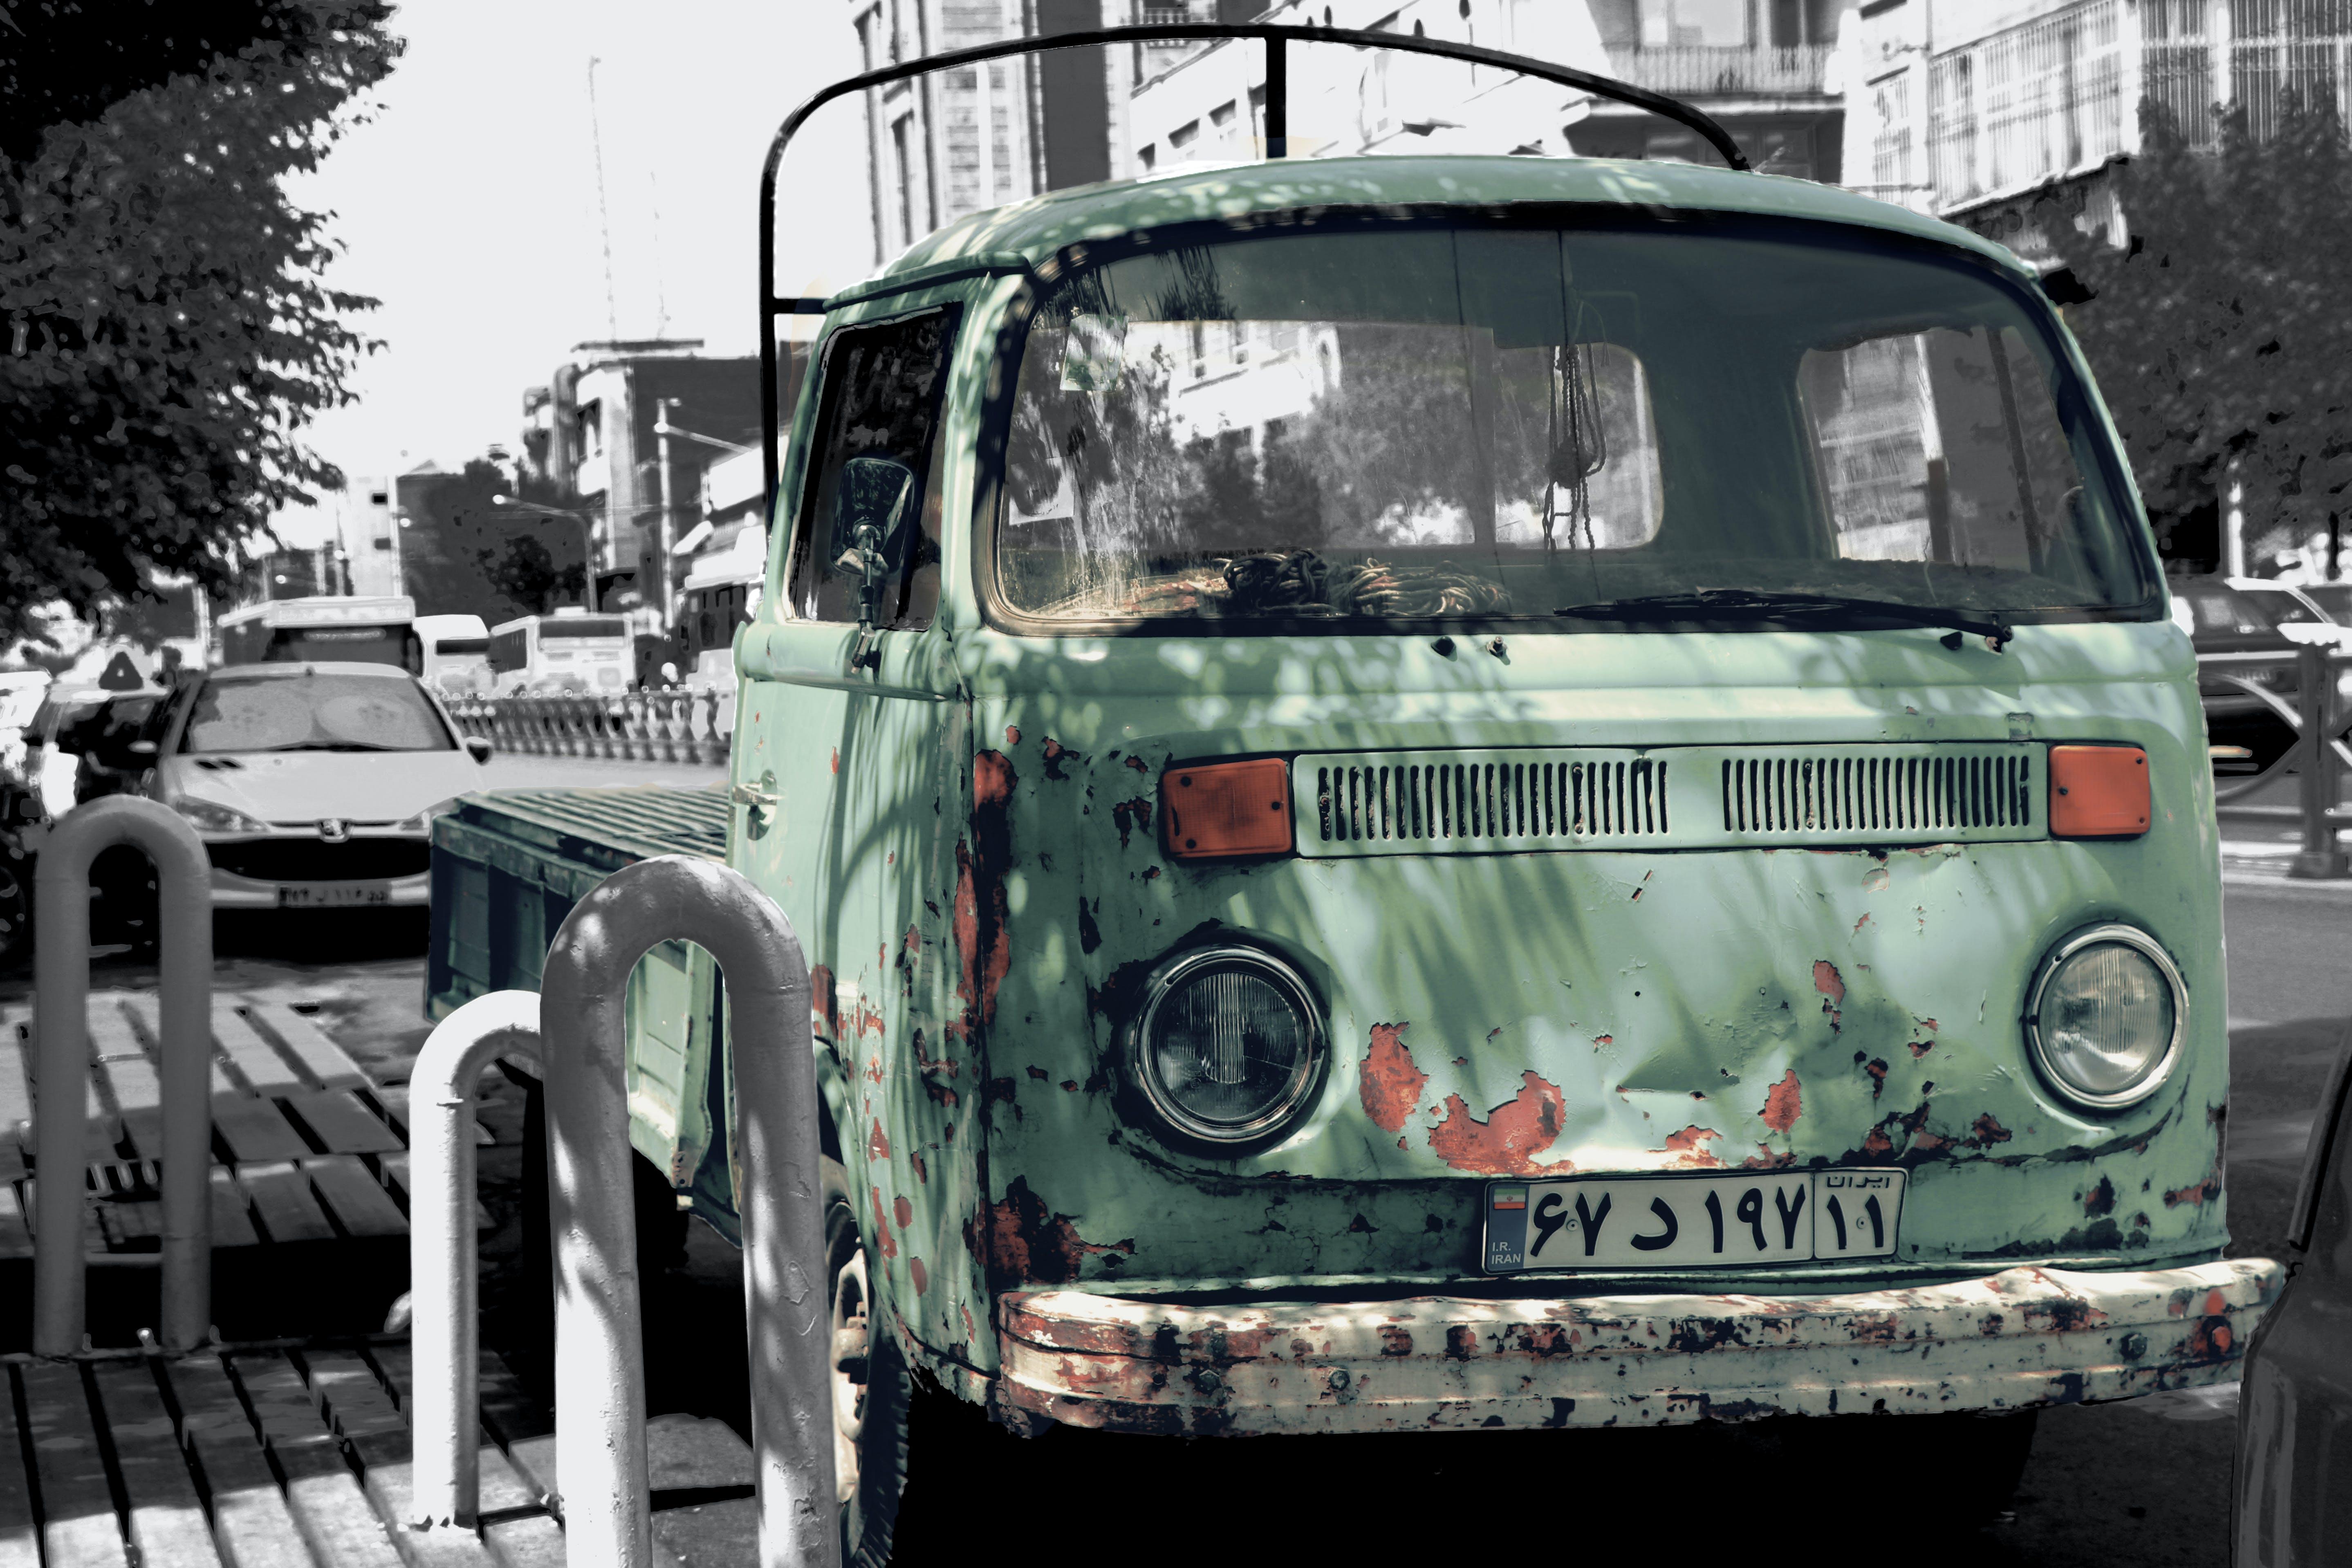 Free stock photo of #old #car #Tehran #street